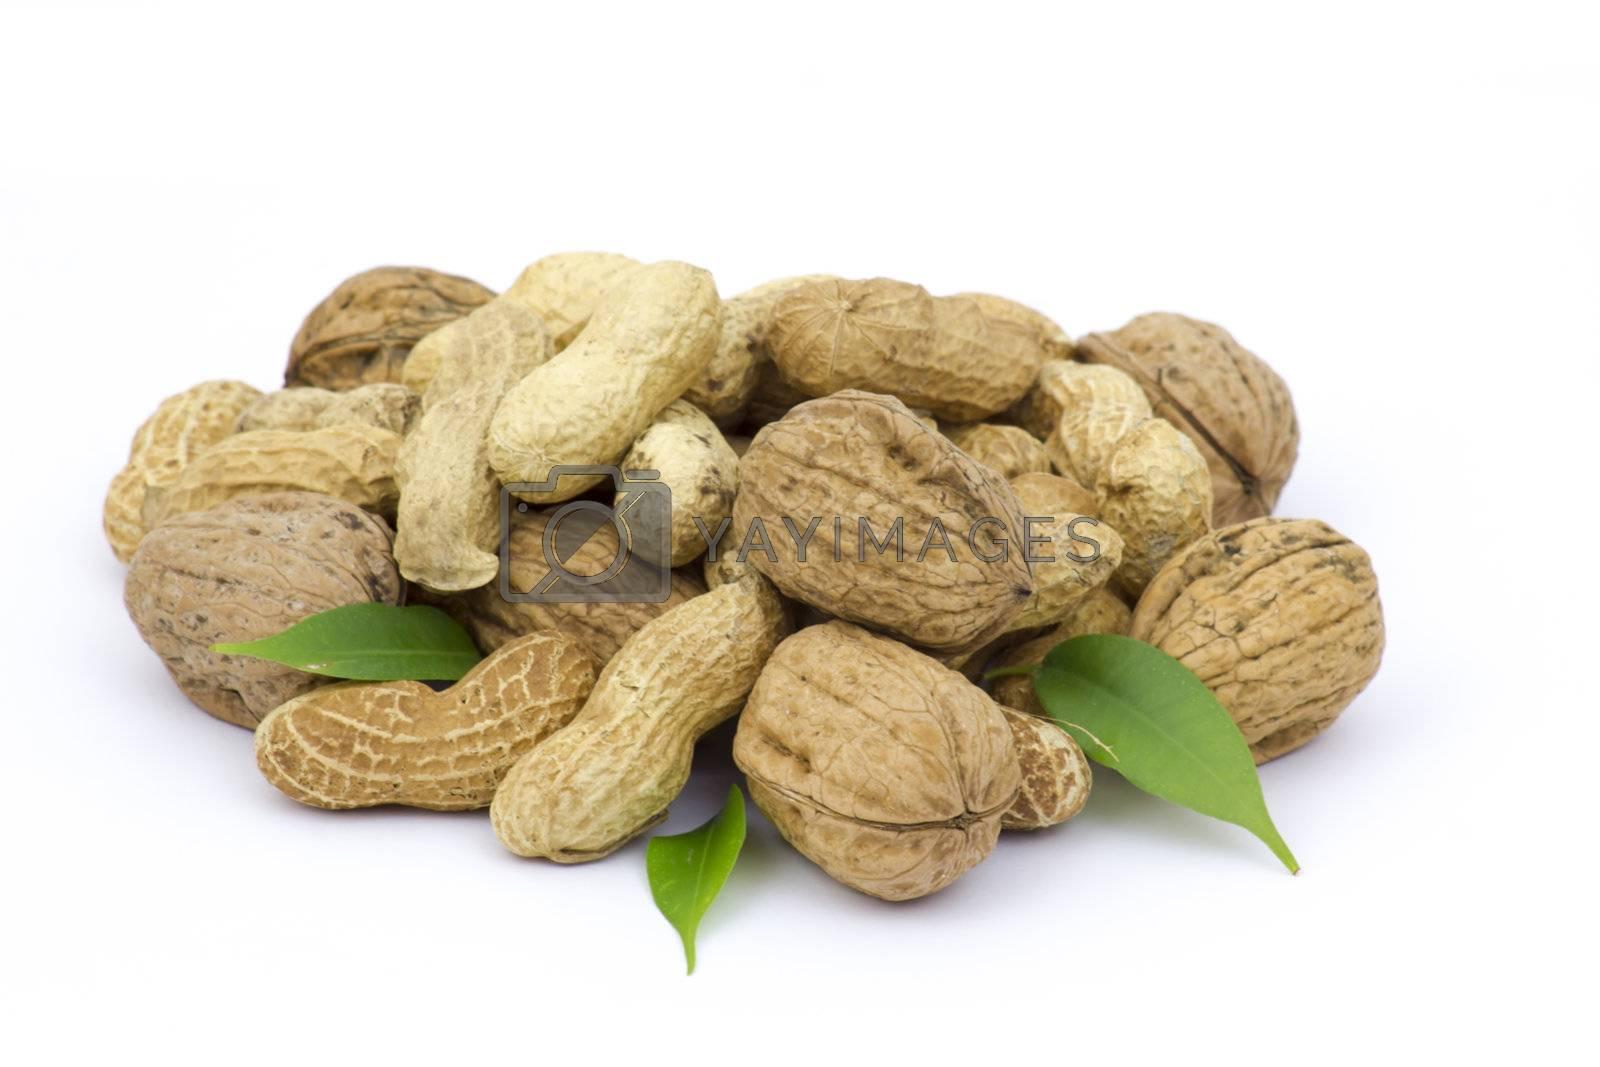 walnuts and peanuts by miradrozdowski